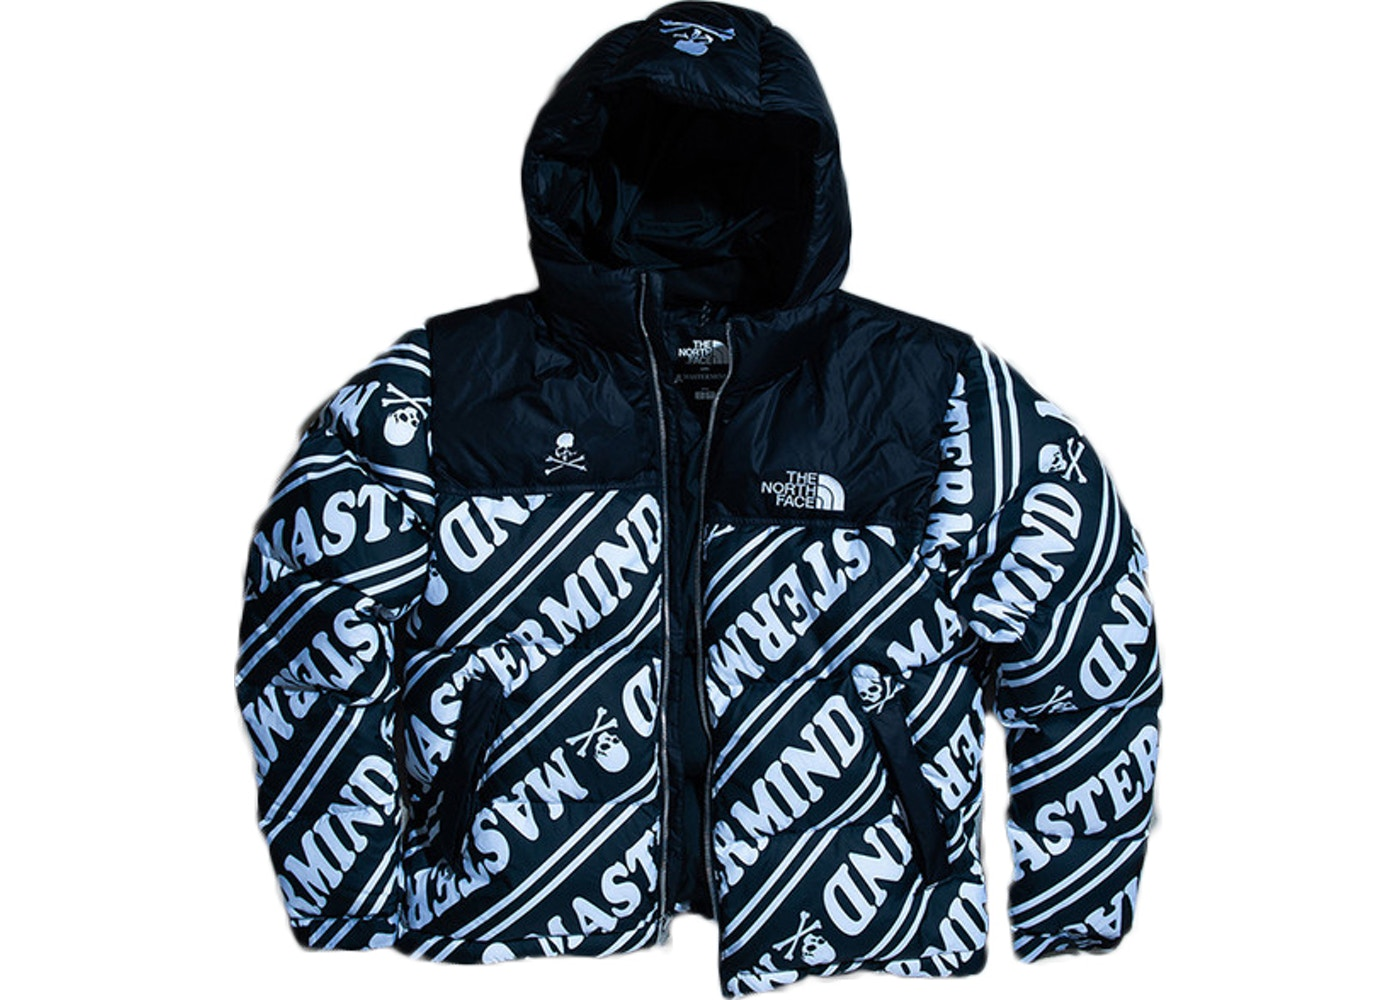 8064f6808 Mastermind The North Face Nuptse Jacket Black/White